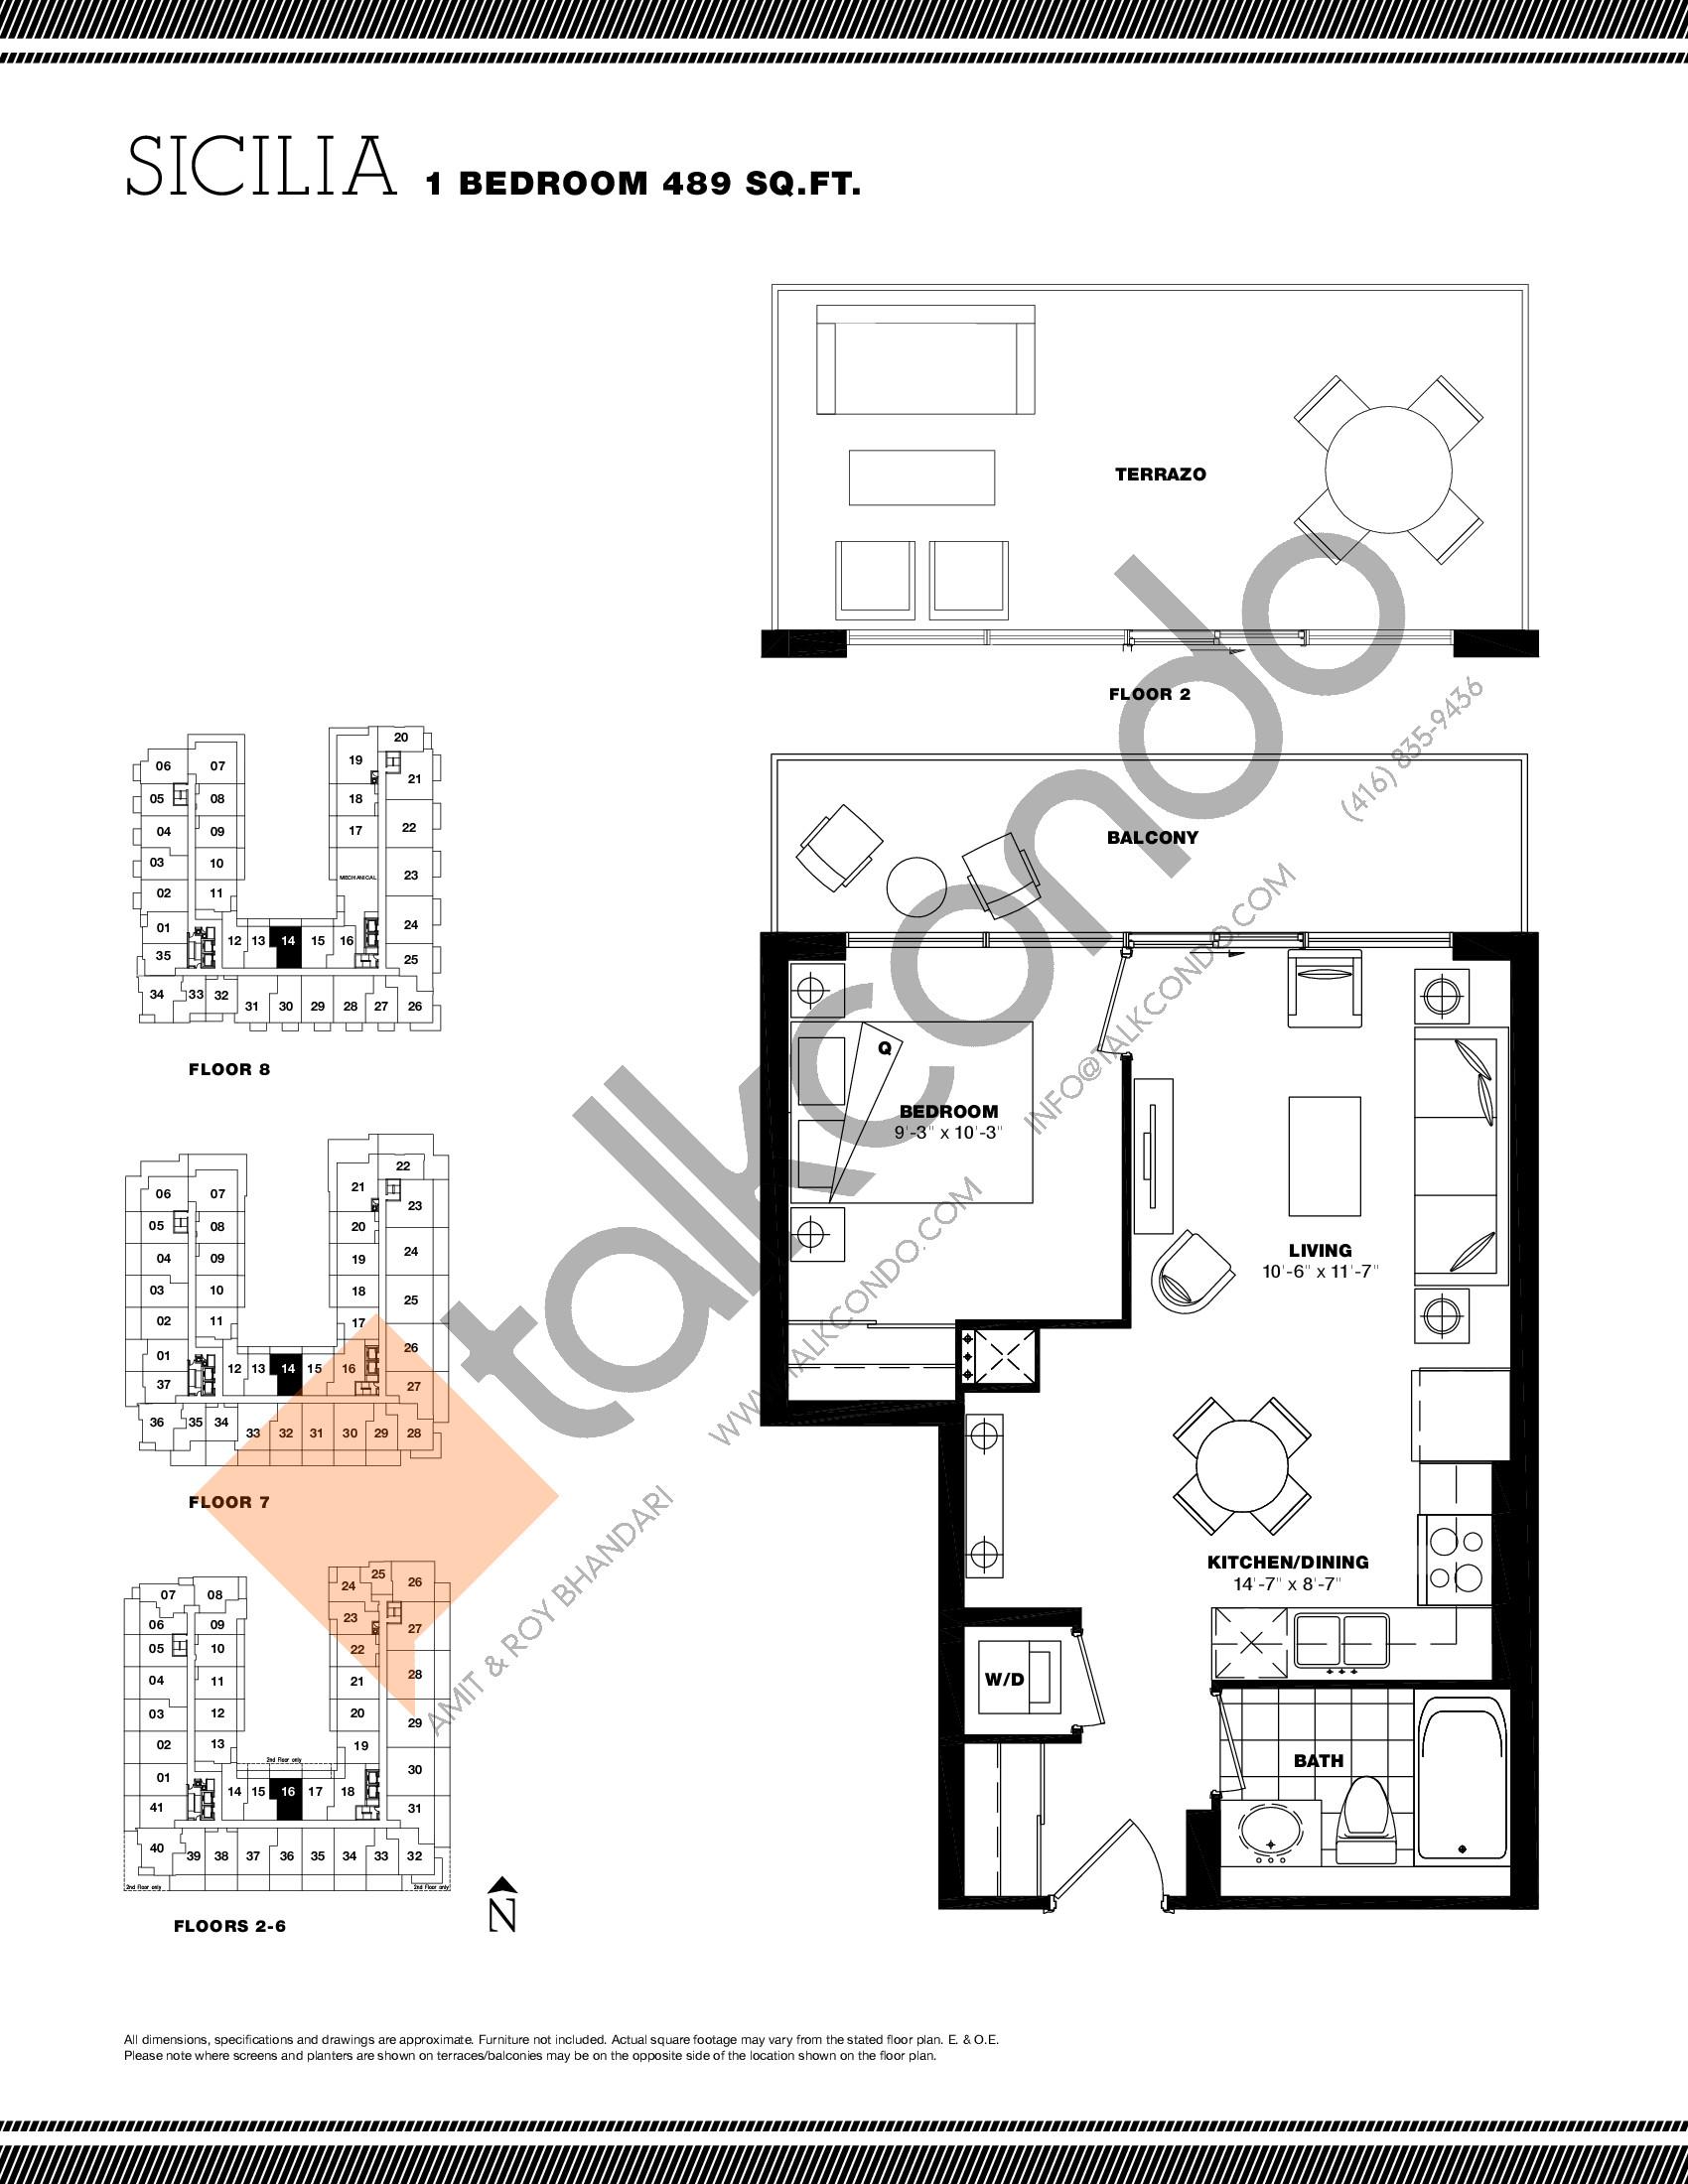 Sicilia Floor Plan at Residenze Palazzo at Treviso 3 Condos - 489 sq.ft